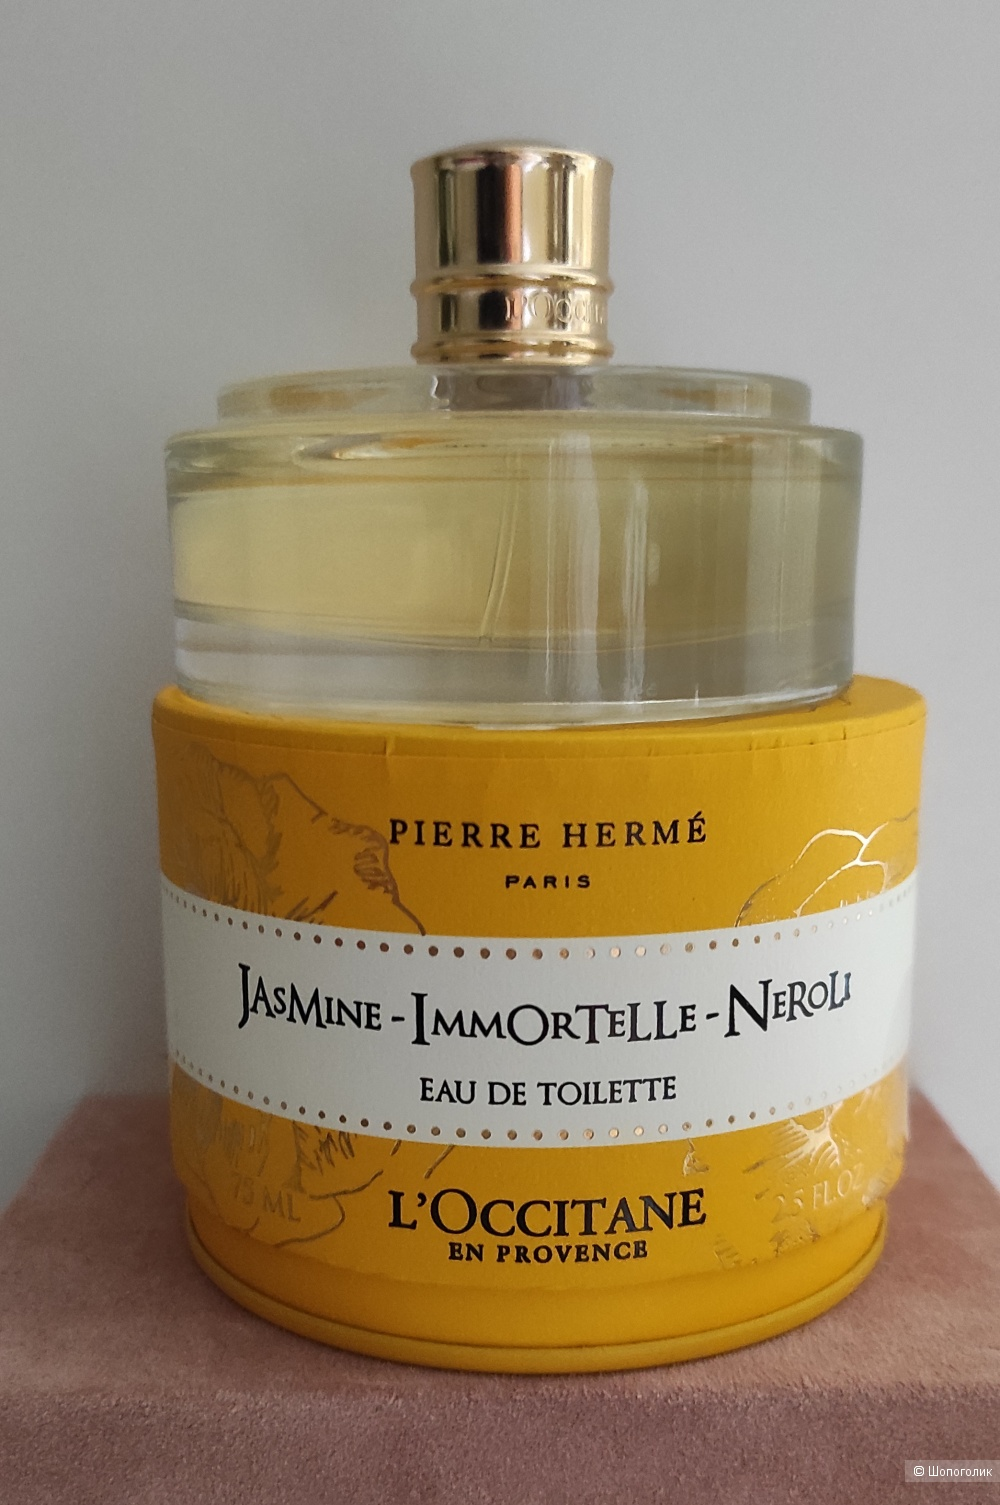 Туал вода Жасмин-Иммортель-Нероли Loccitane, 75 мл.